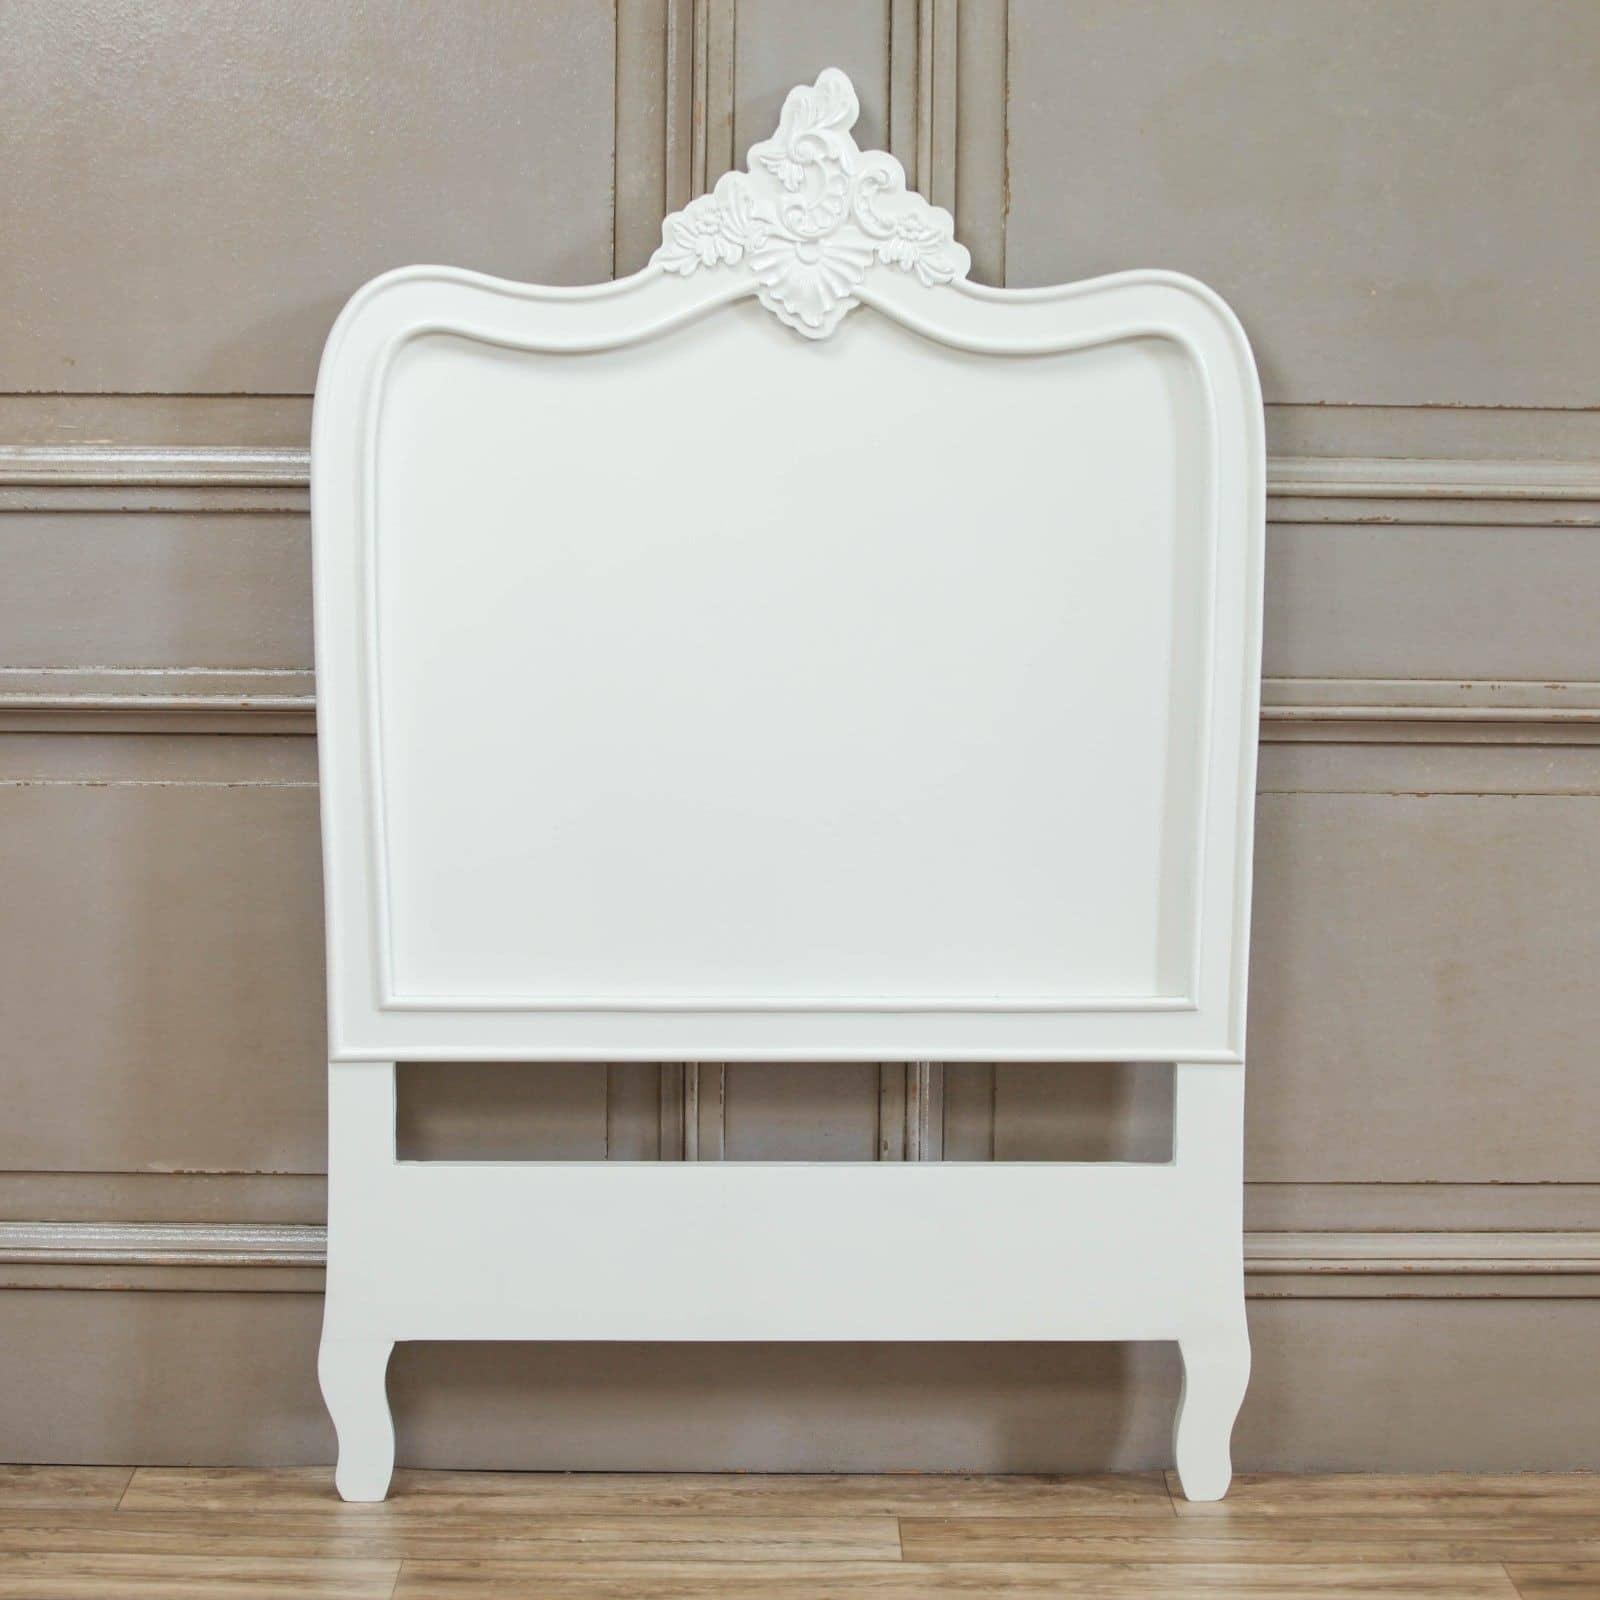 French White 3ft Single Headboard Furniture La Maison